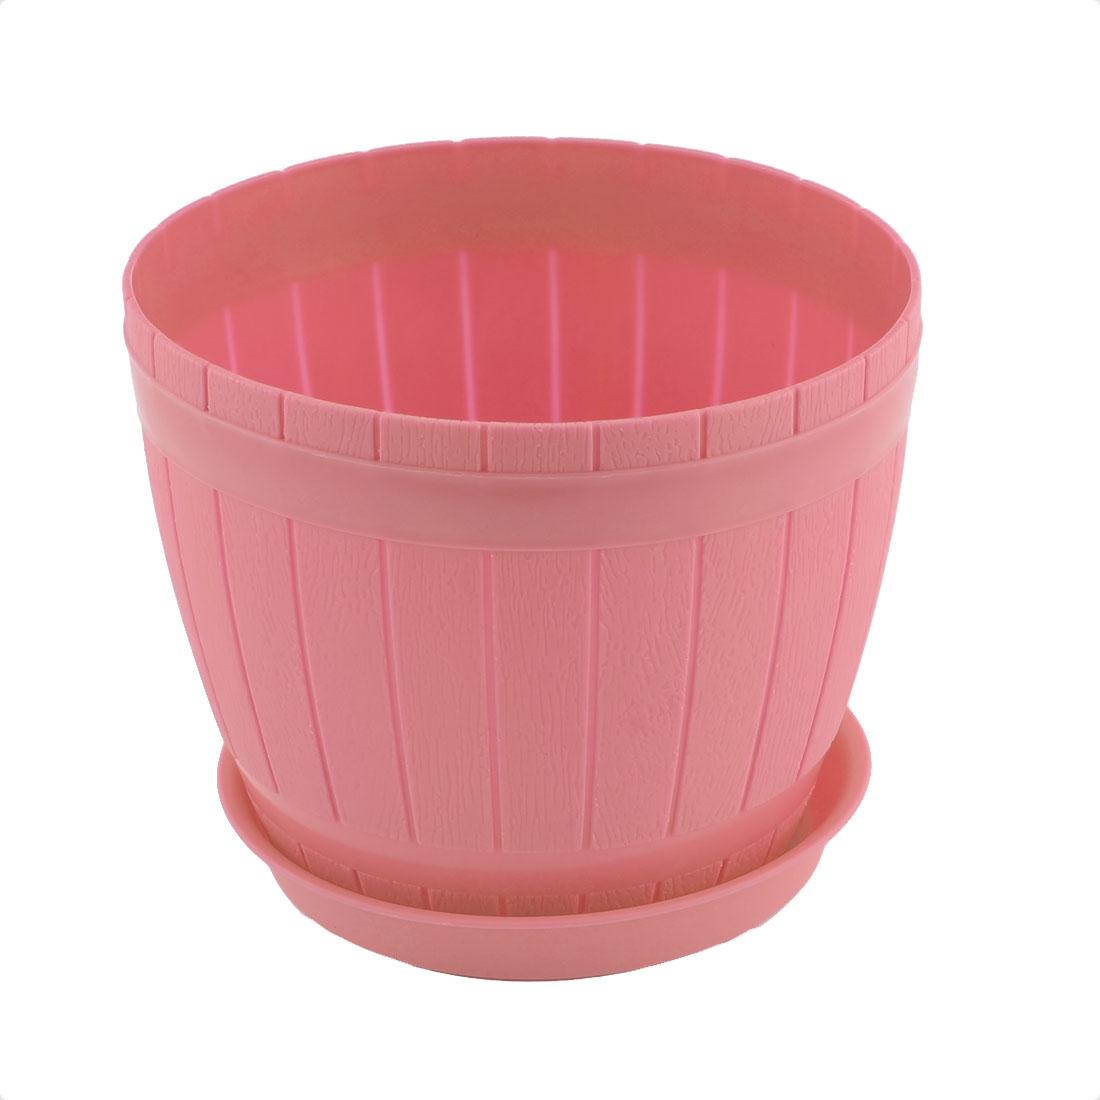 Home Windowsill Office Plastic Box Shape Plant Flower Pot Planter Pink w Tray